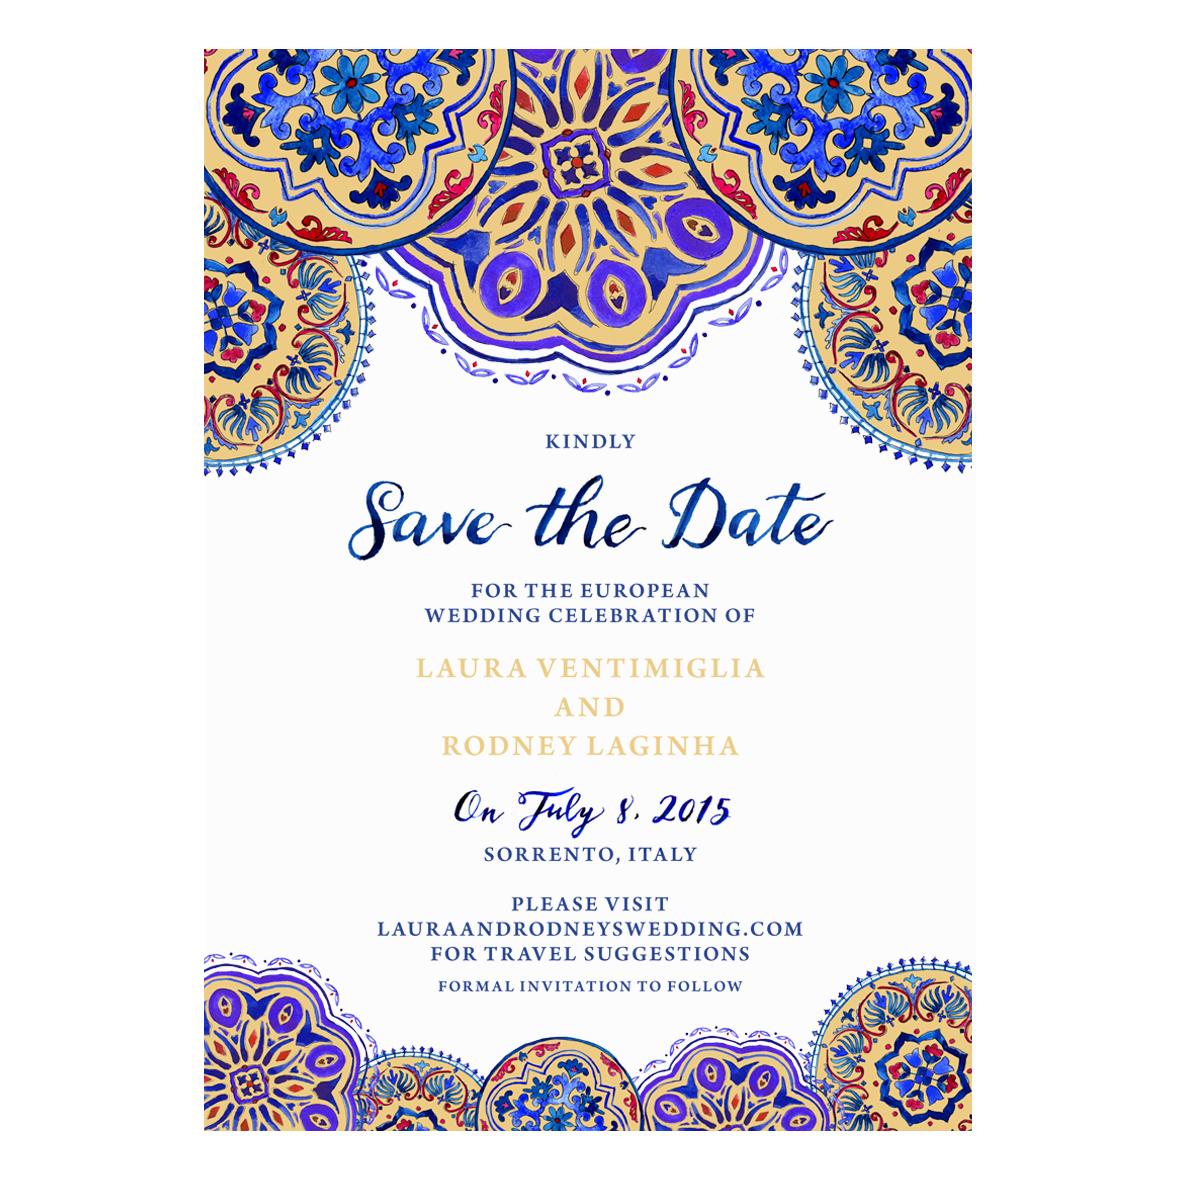 invite14.jpg